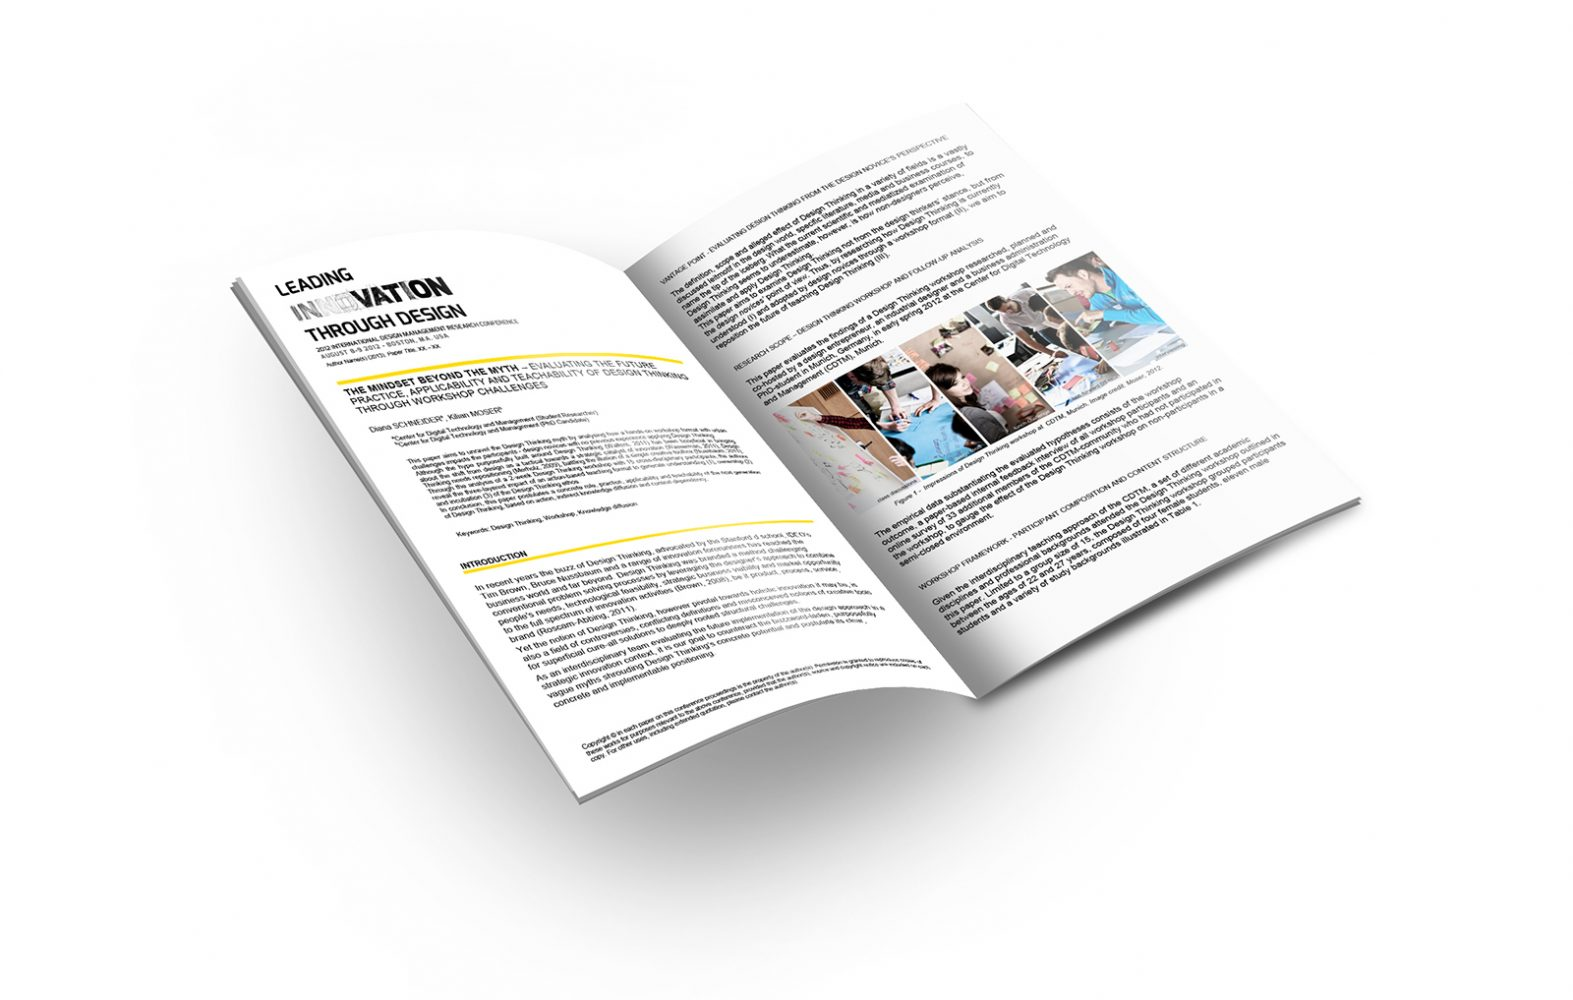 thinkbrisk.com - BRISK Business Design Thinking - case: Mindset beyond the Myth Impact of Workshops Research DMI